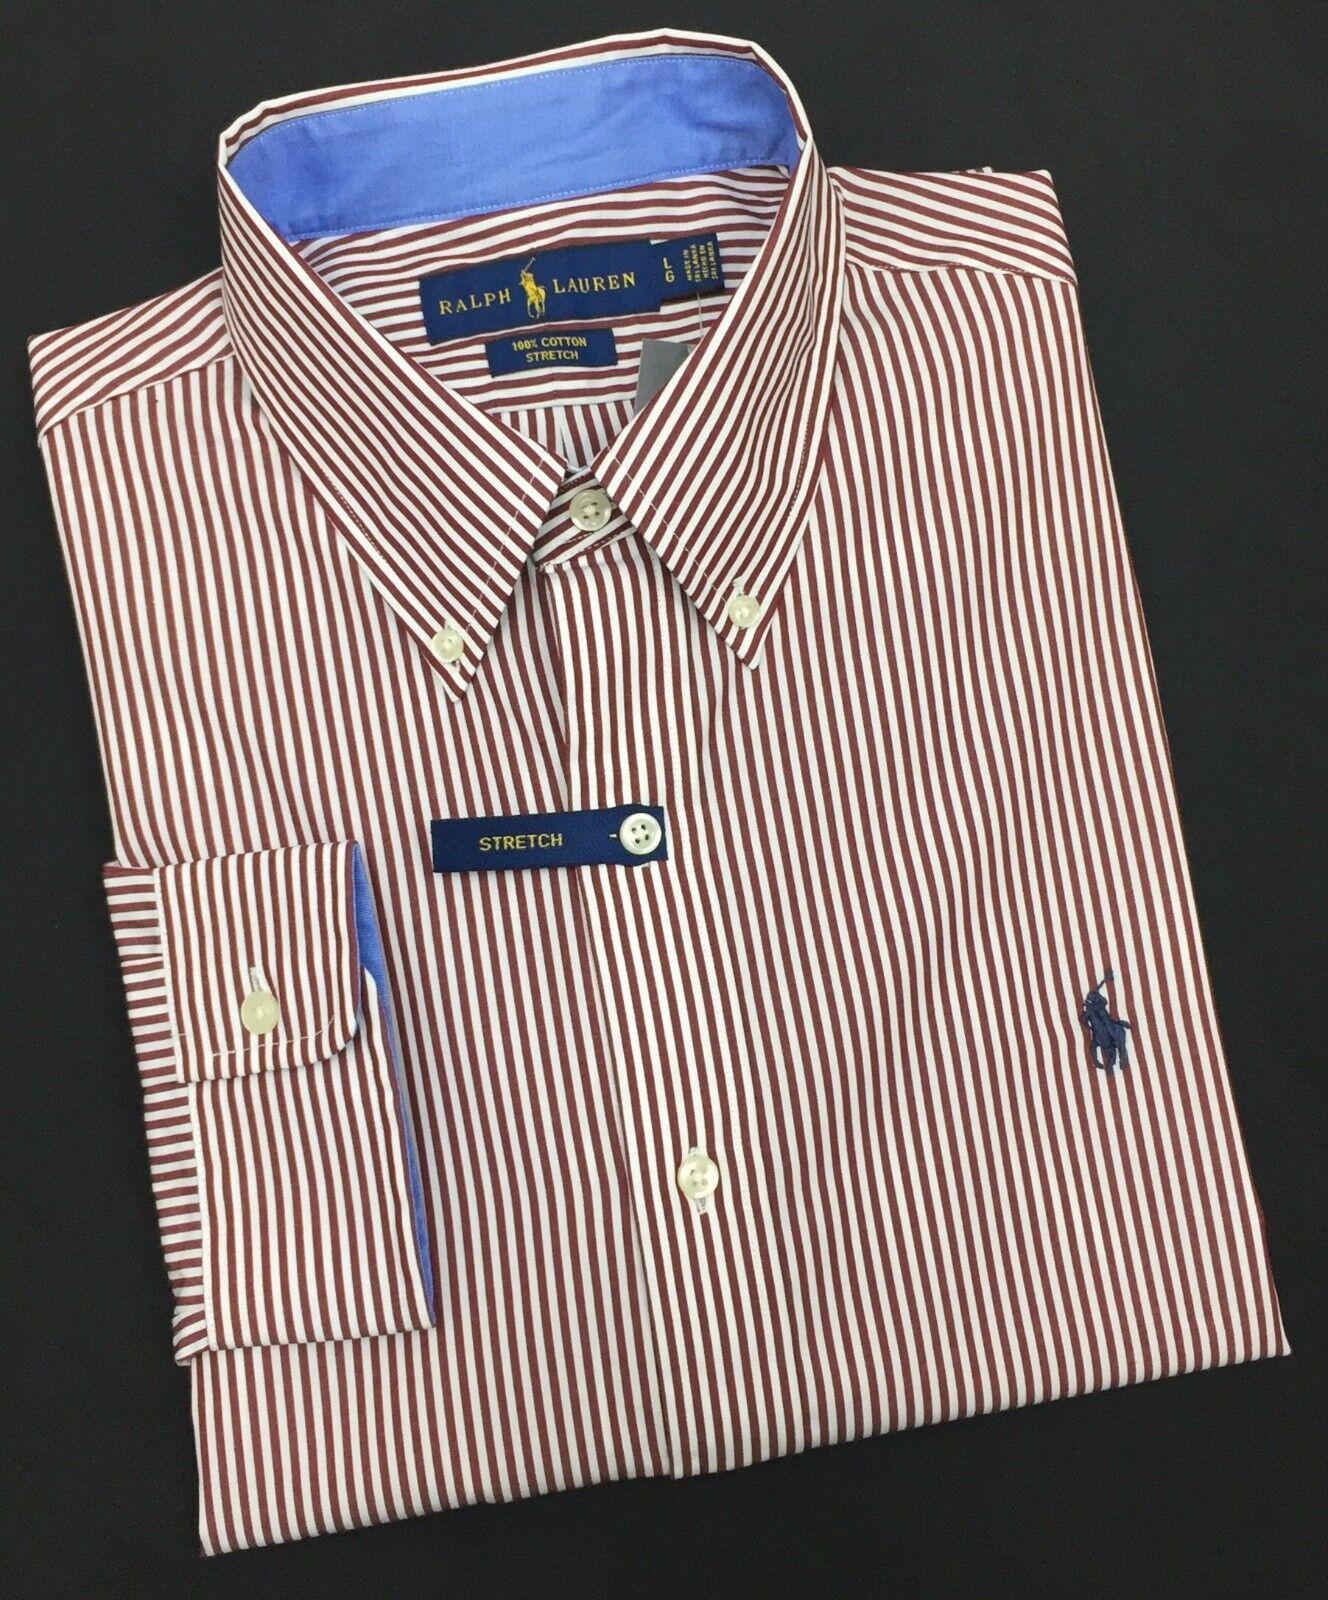 d9c9ca74 Ralph Lauren Long Sleeve Shirt 100% Cotton Stretch shirt Burgundy White  Stripe